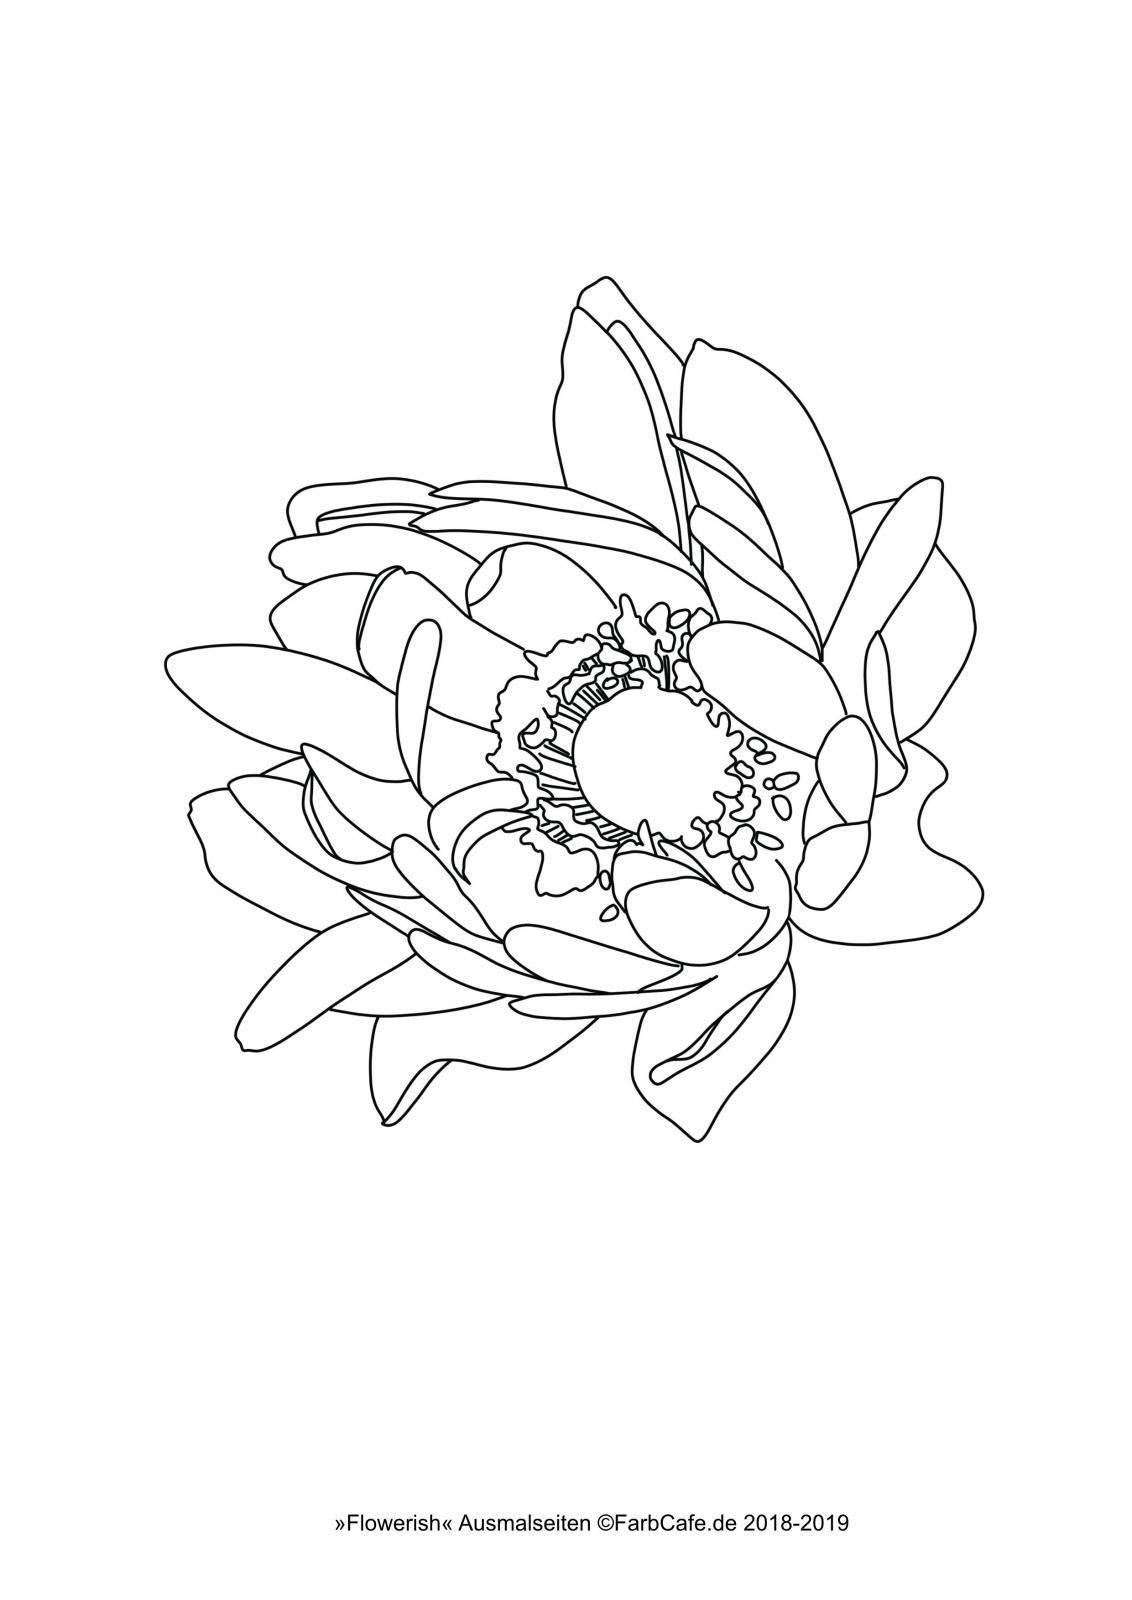 Wie Lerne Ich Aquarellmalen Aquarell Fur Anfanger Aquarell Tattoo Roman Arabische Tattoos